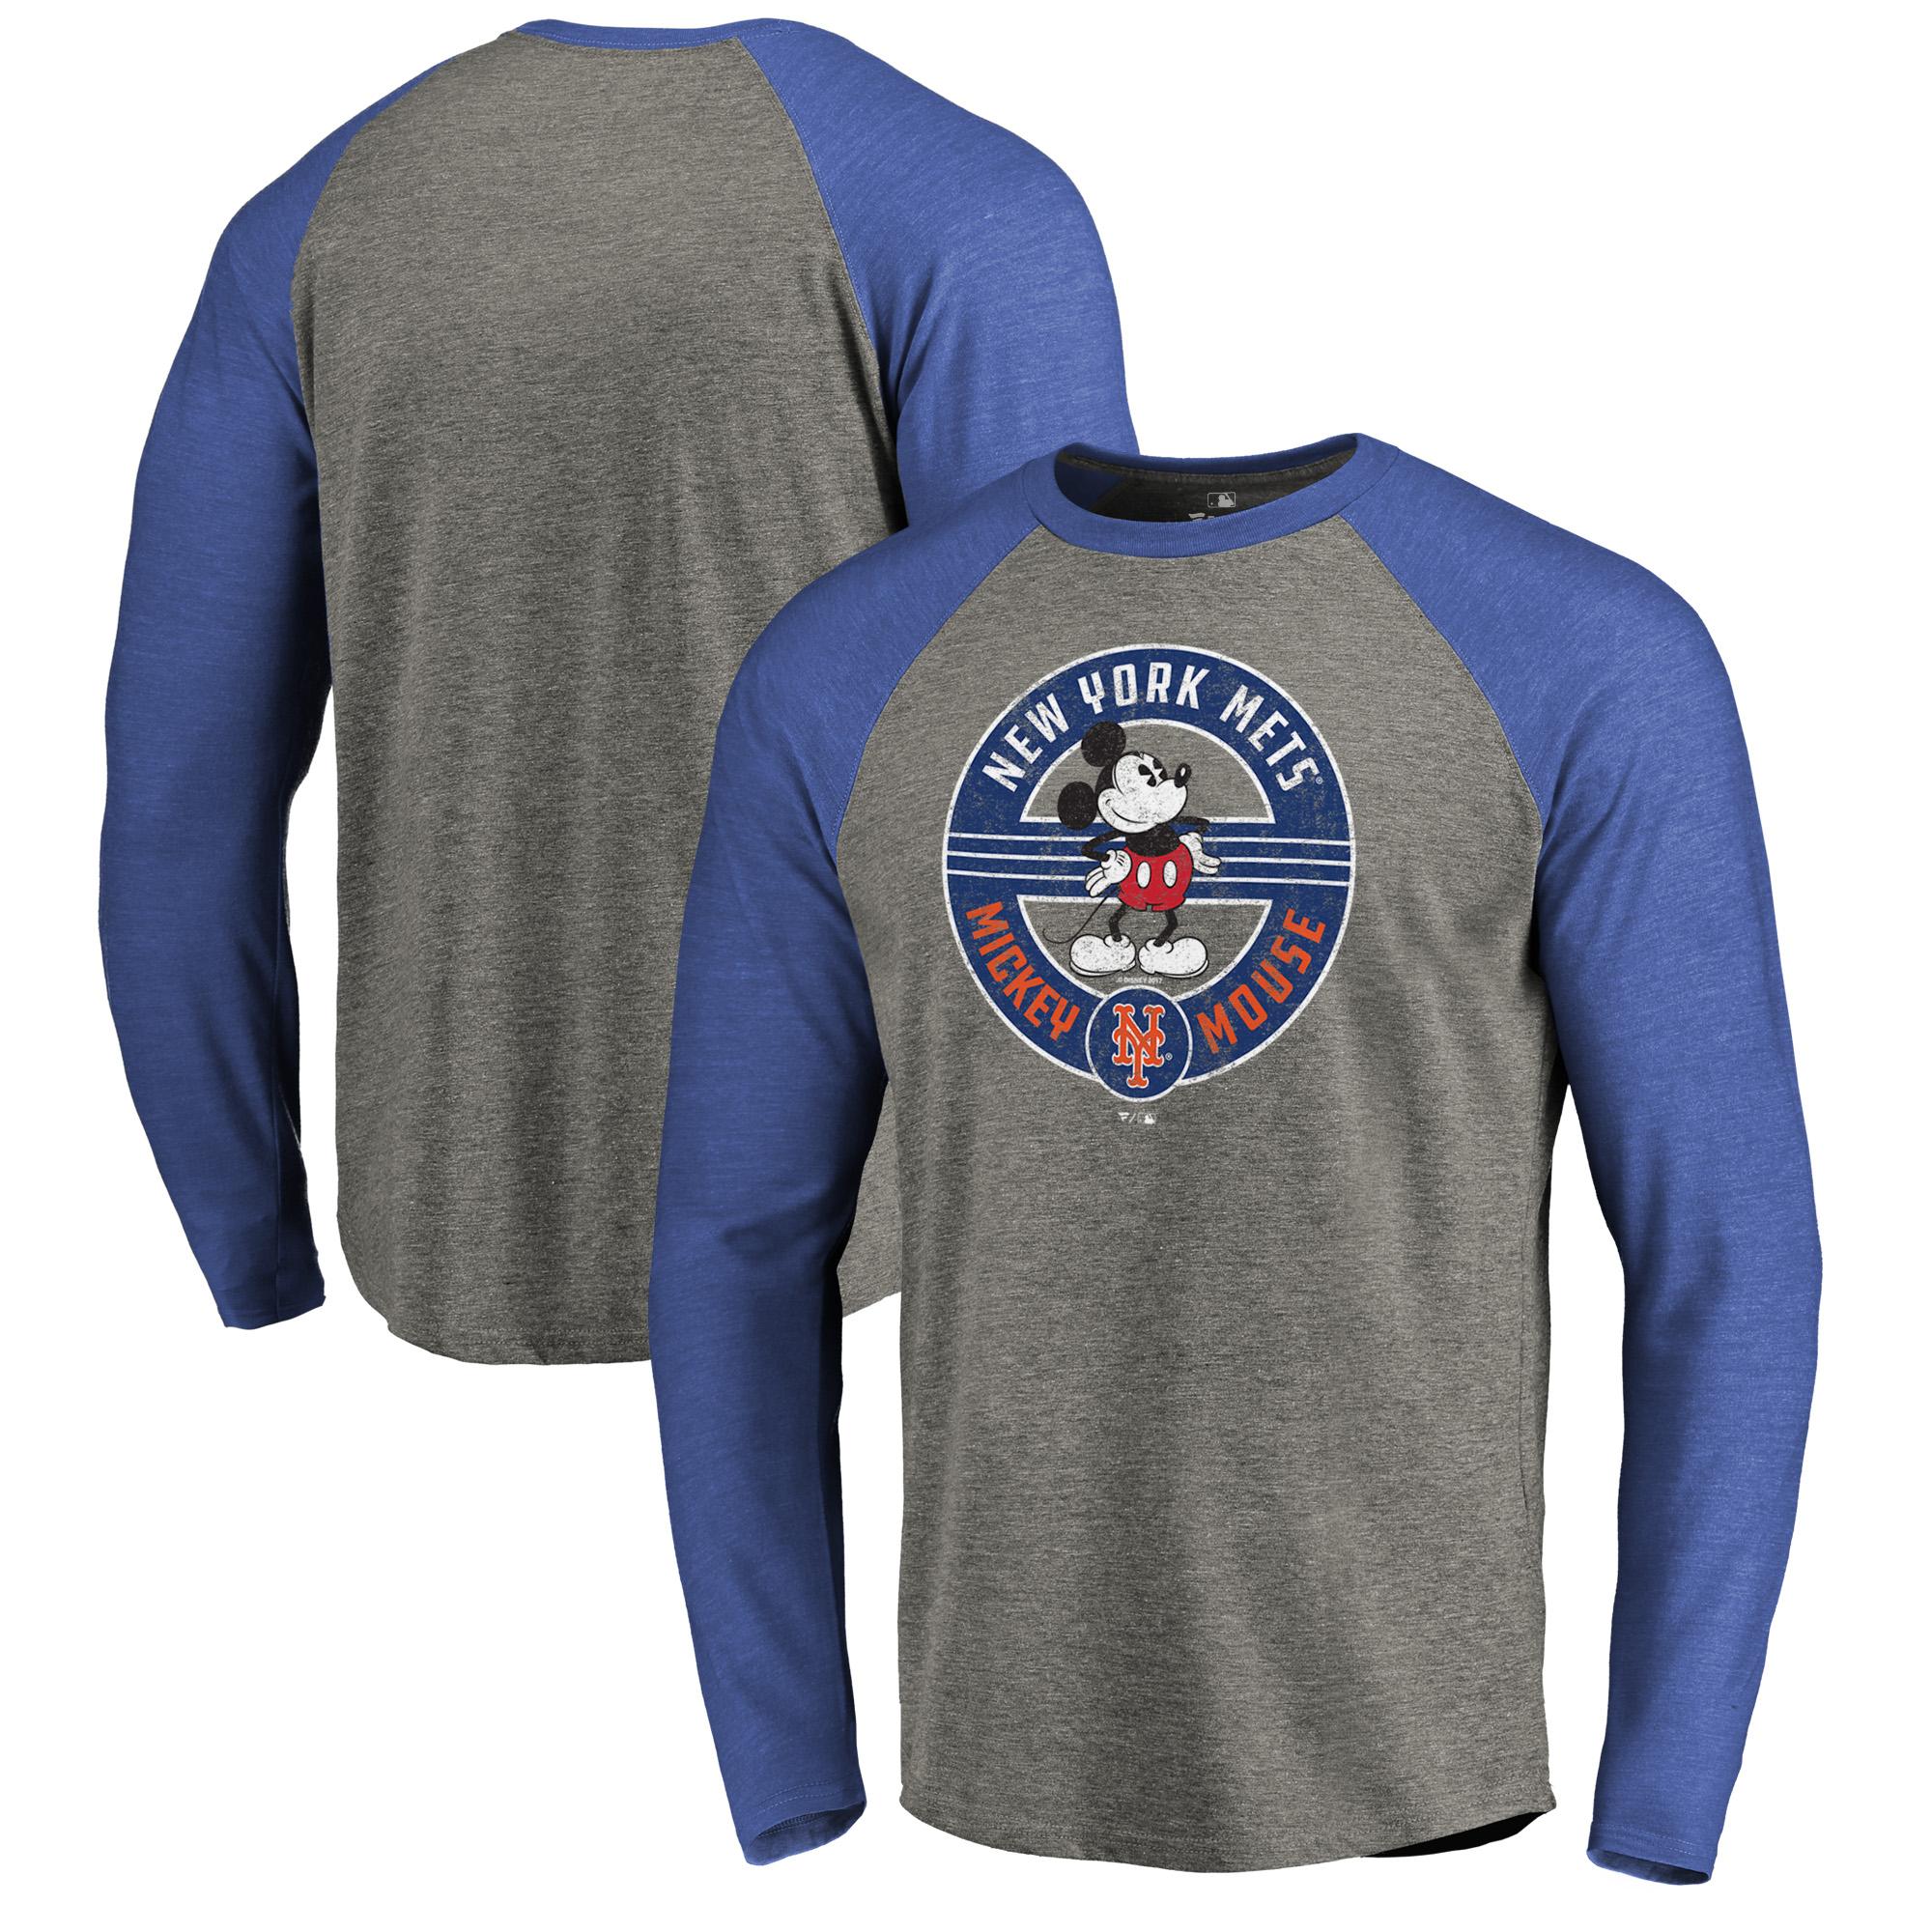 New York Mets Fanatics Branded Disney Mickey's True Original Seal Long Sleeve Tri-Blend Raglan T-Shirt - Heathered Gray